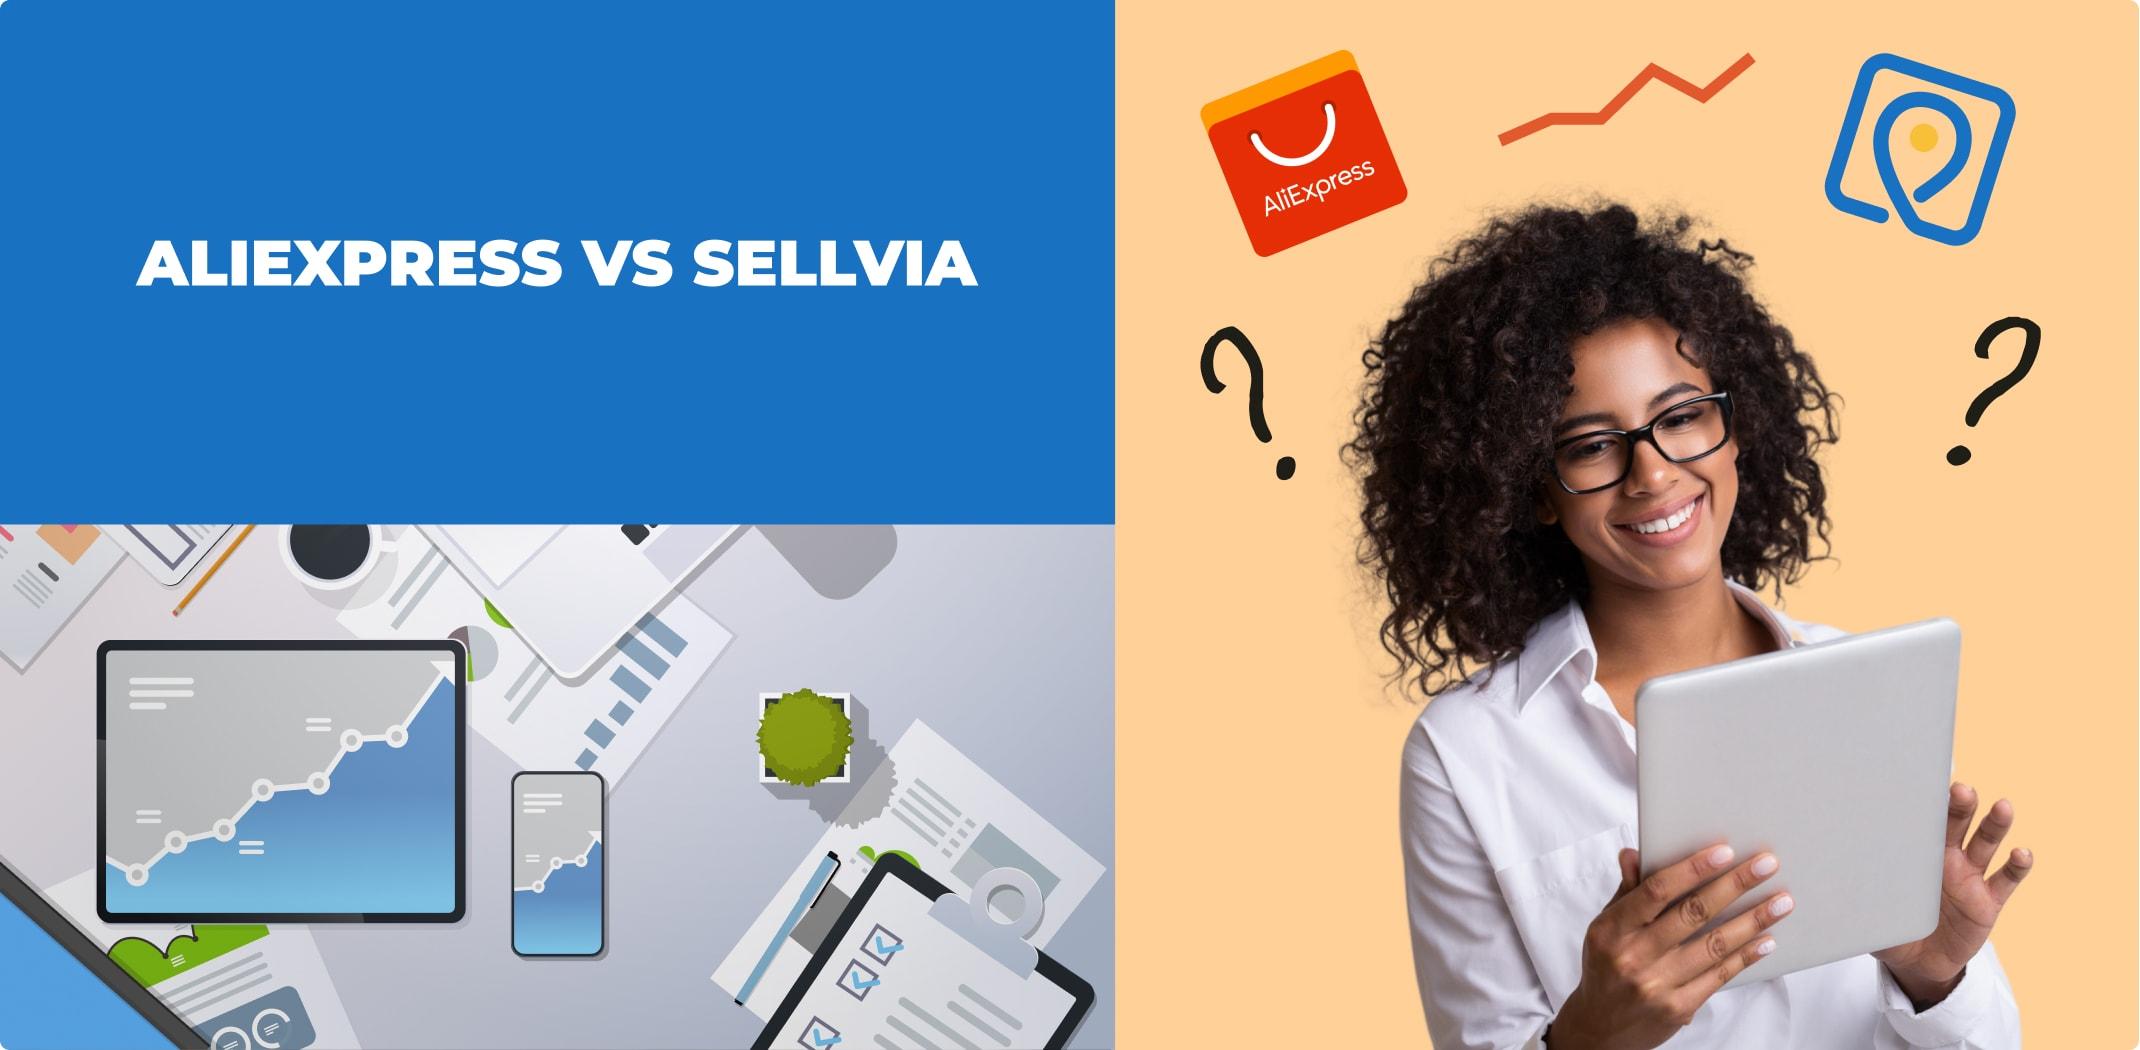 aliexpress-vs-sellvia